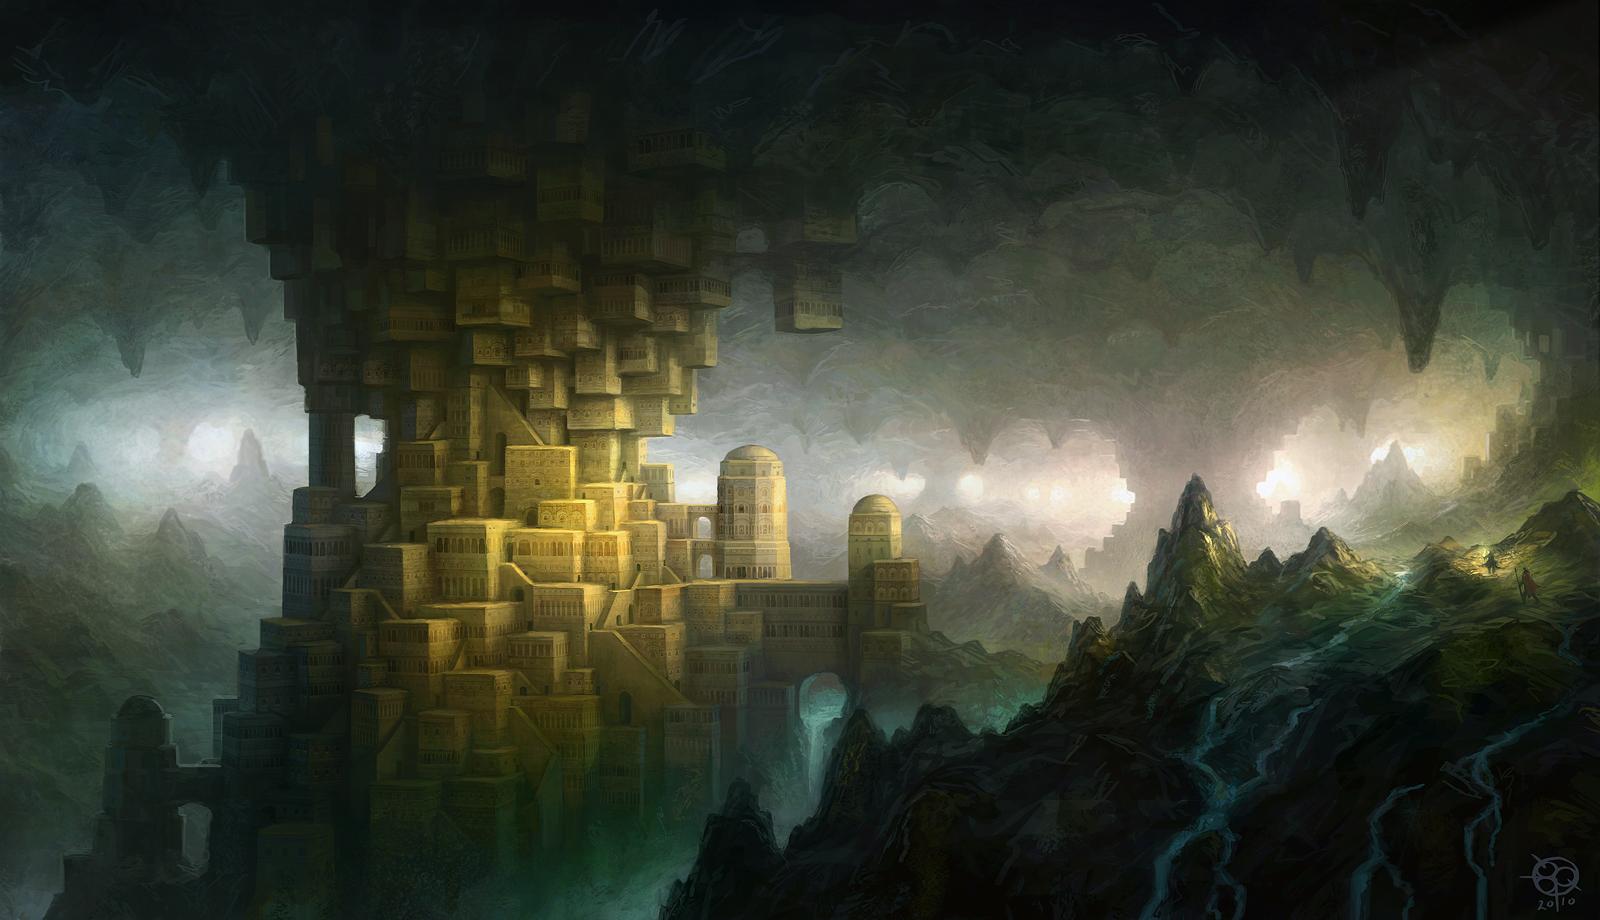 Drawn cavern subterranean Cavern hidden cavern cities artwork